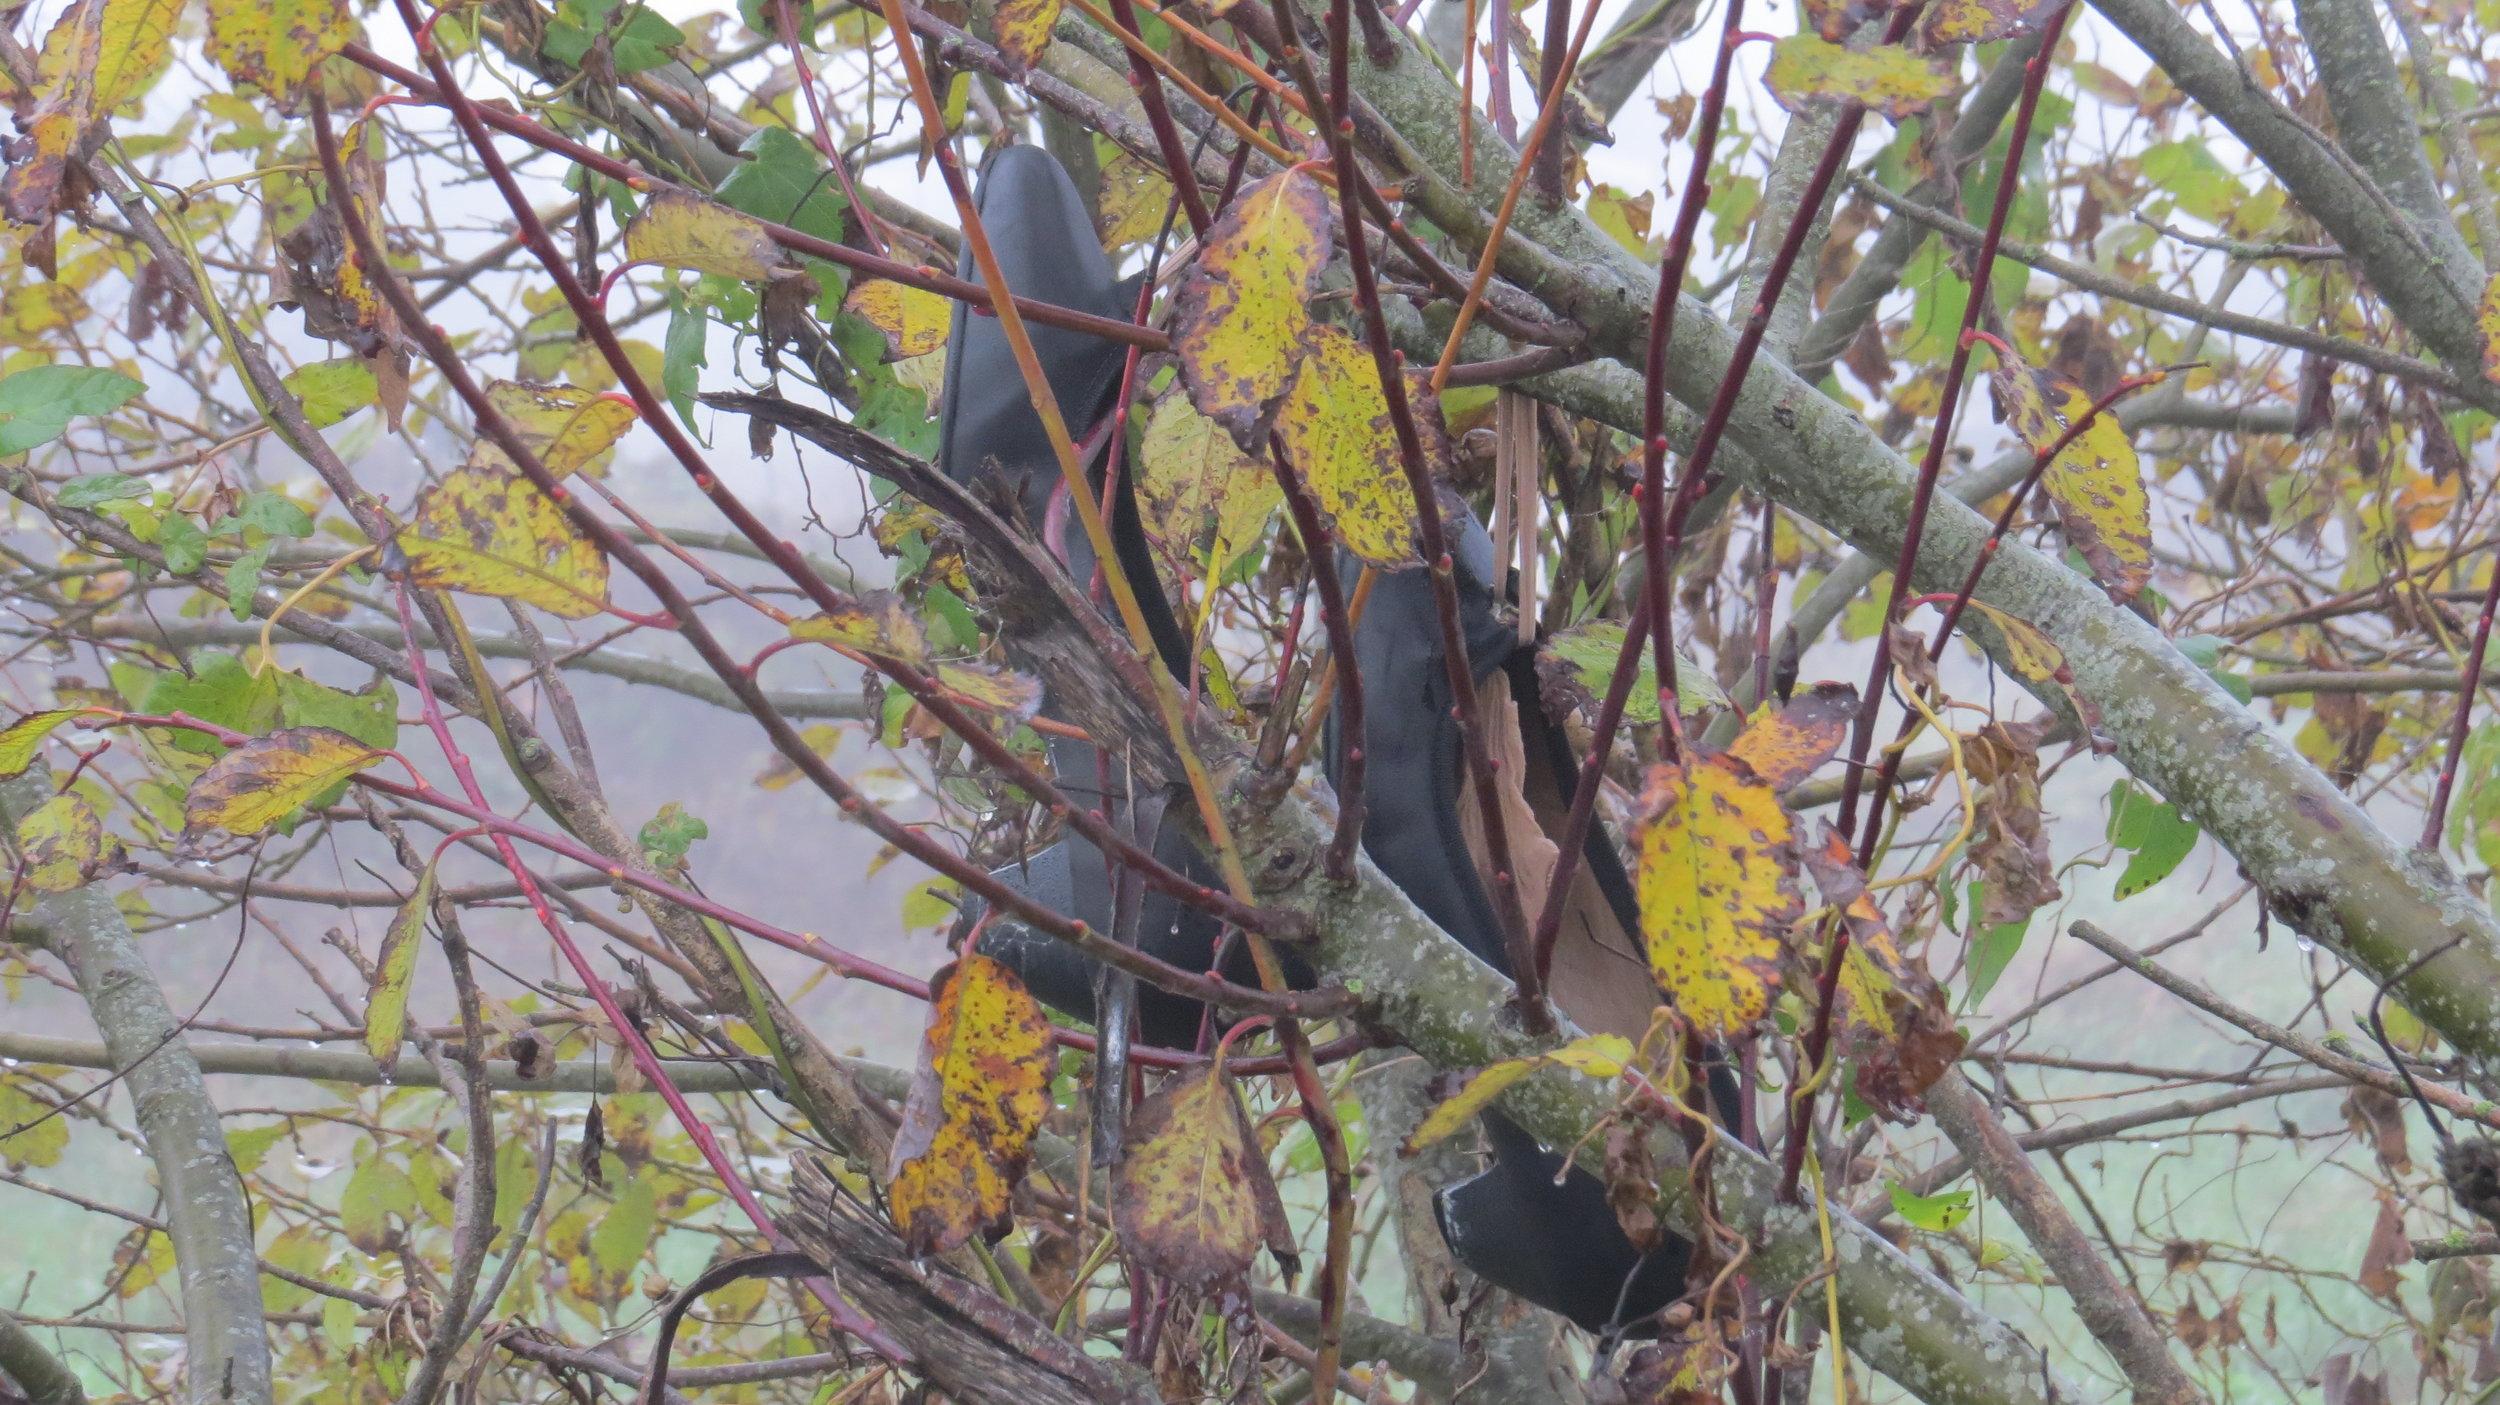 Interesting 'Fruit' on the Tree